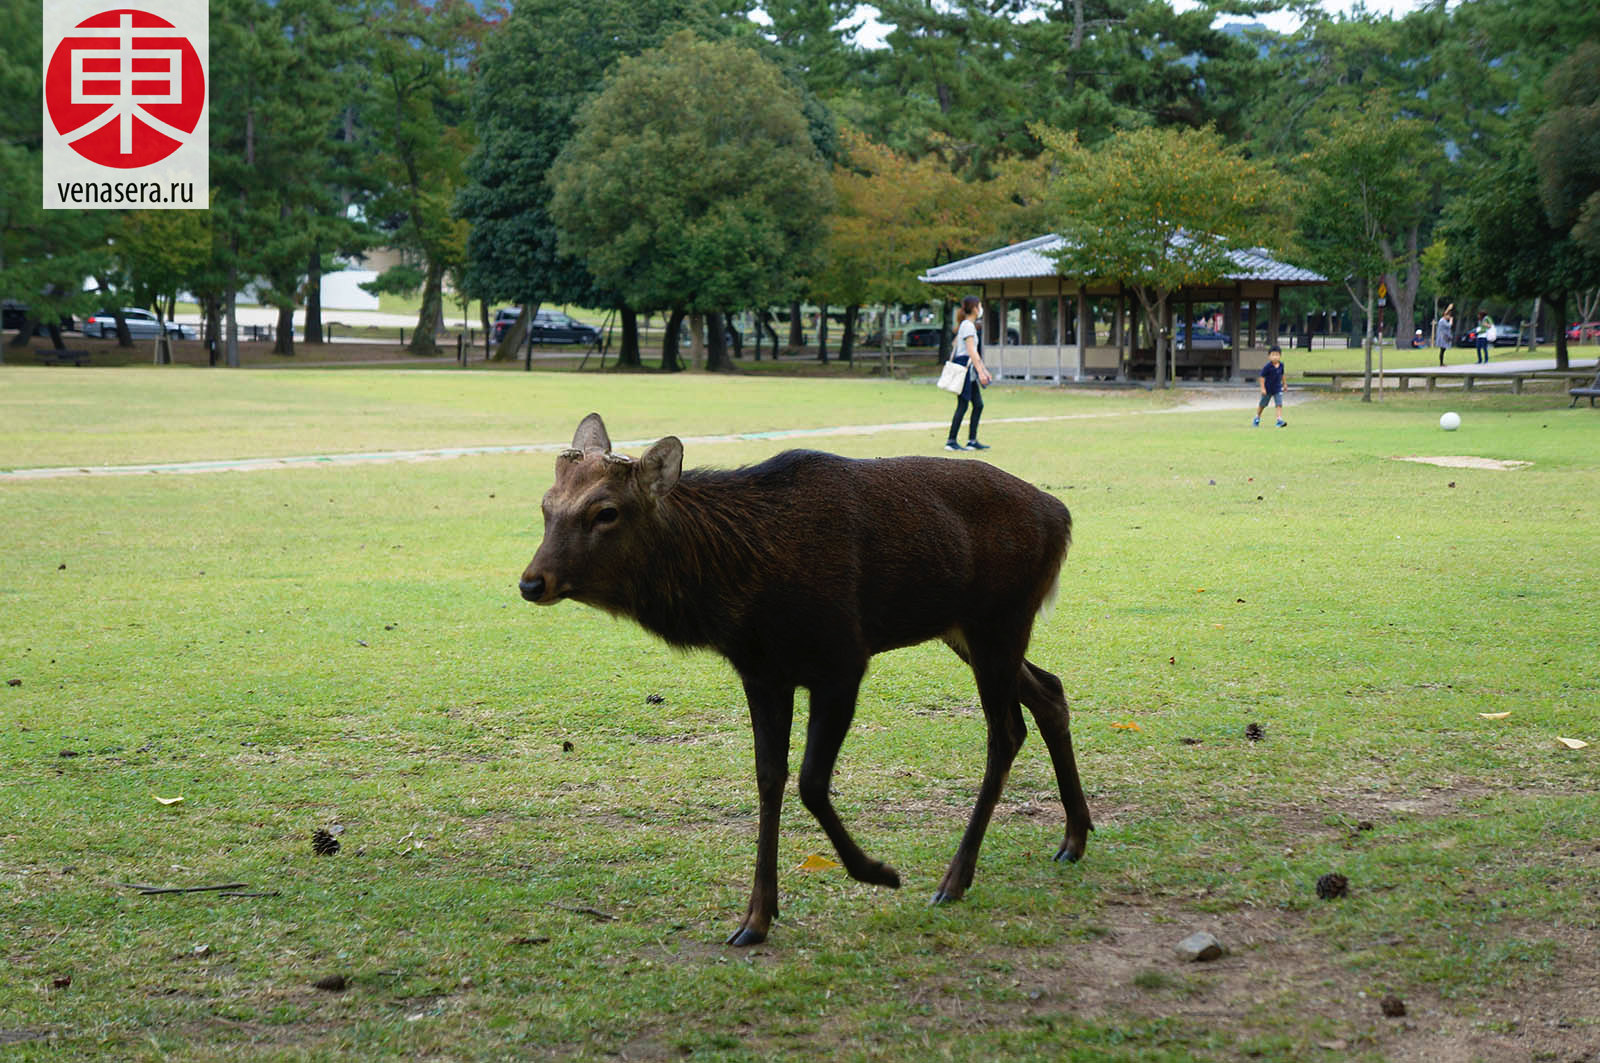 Парк в Нара, Путешествие в Нара, Поездка в Нара, Олени в г. Нара, Парк Нара, Нара, Nara, 奈良, Япония, Japan, 日本.